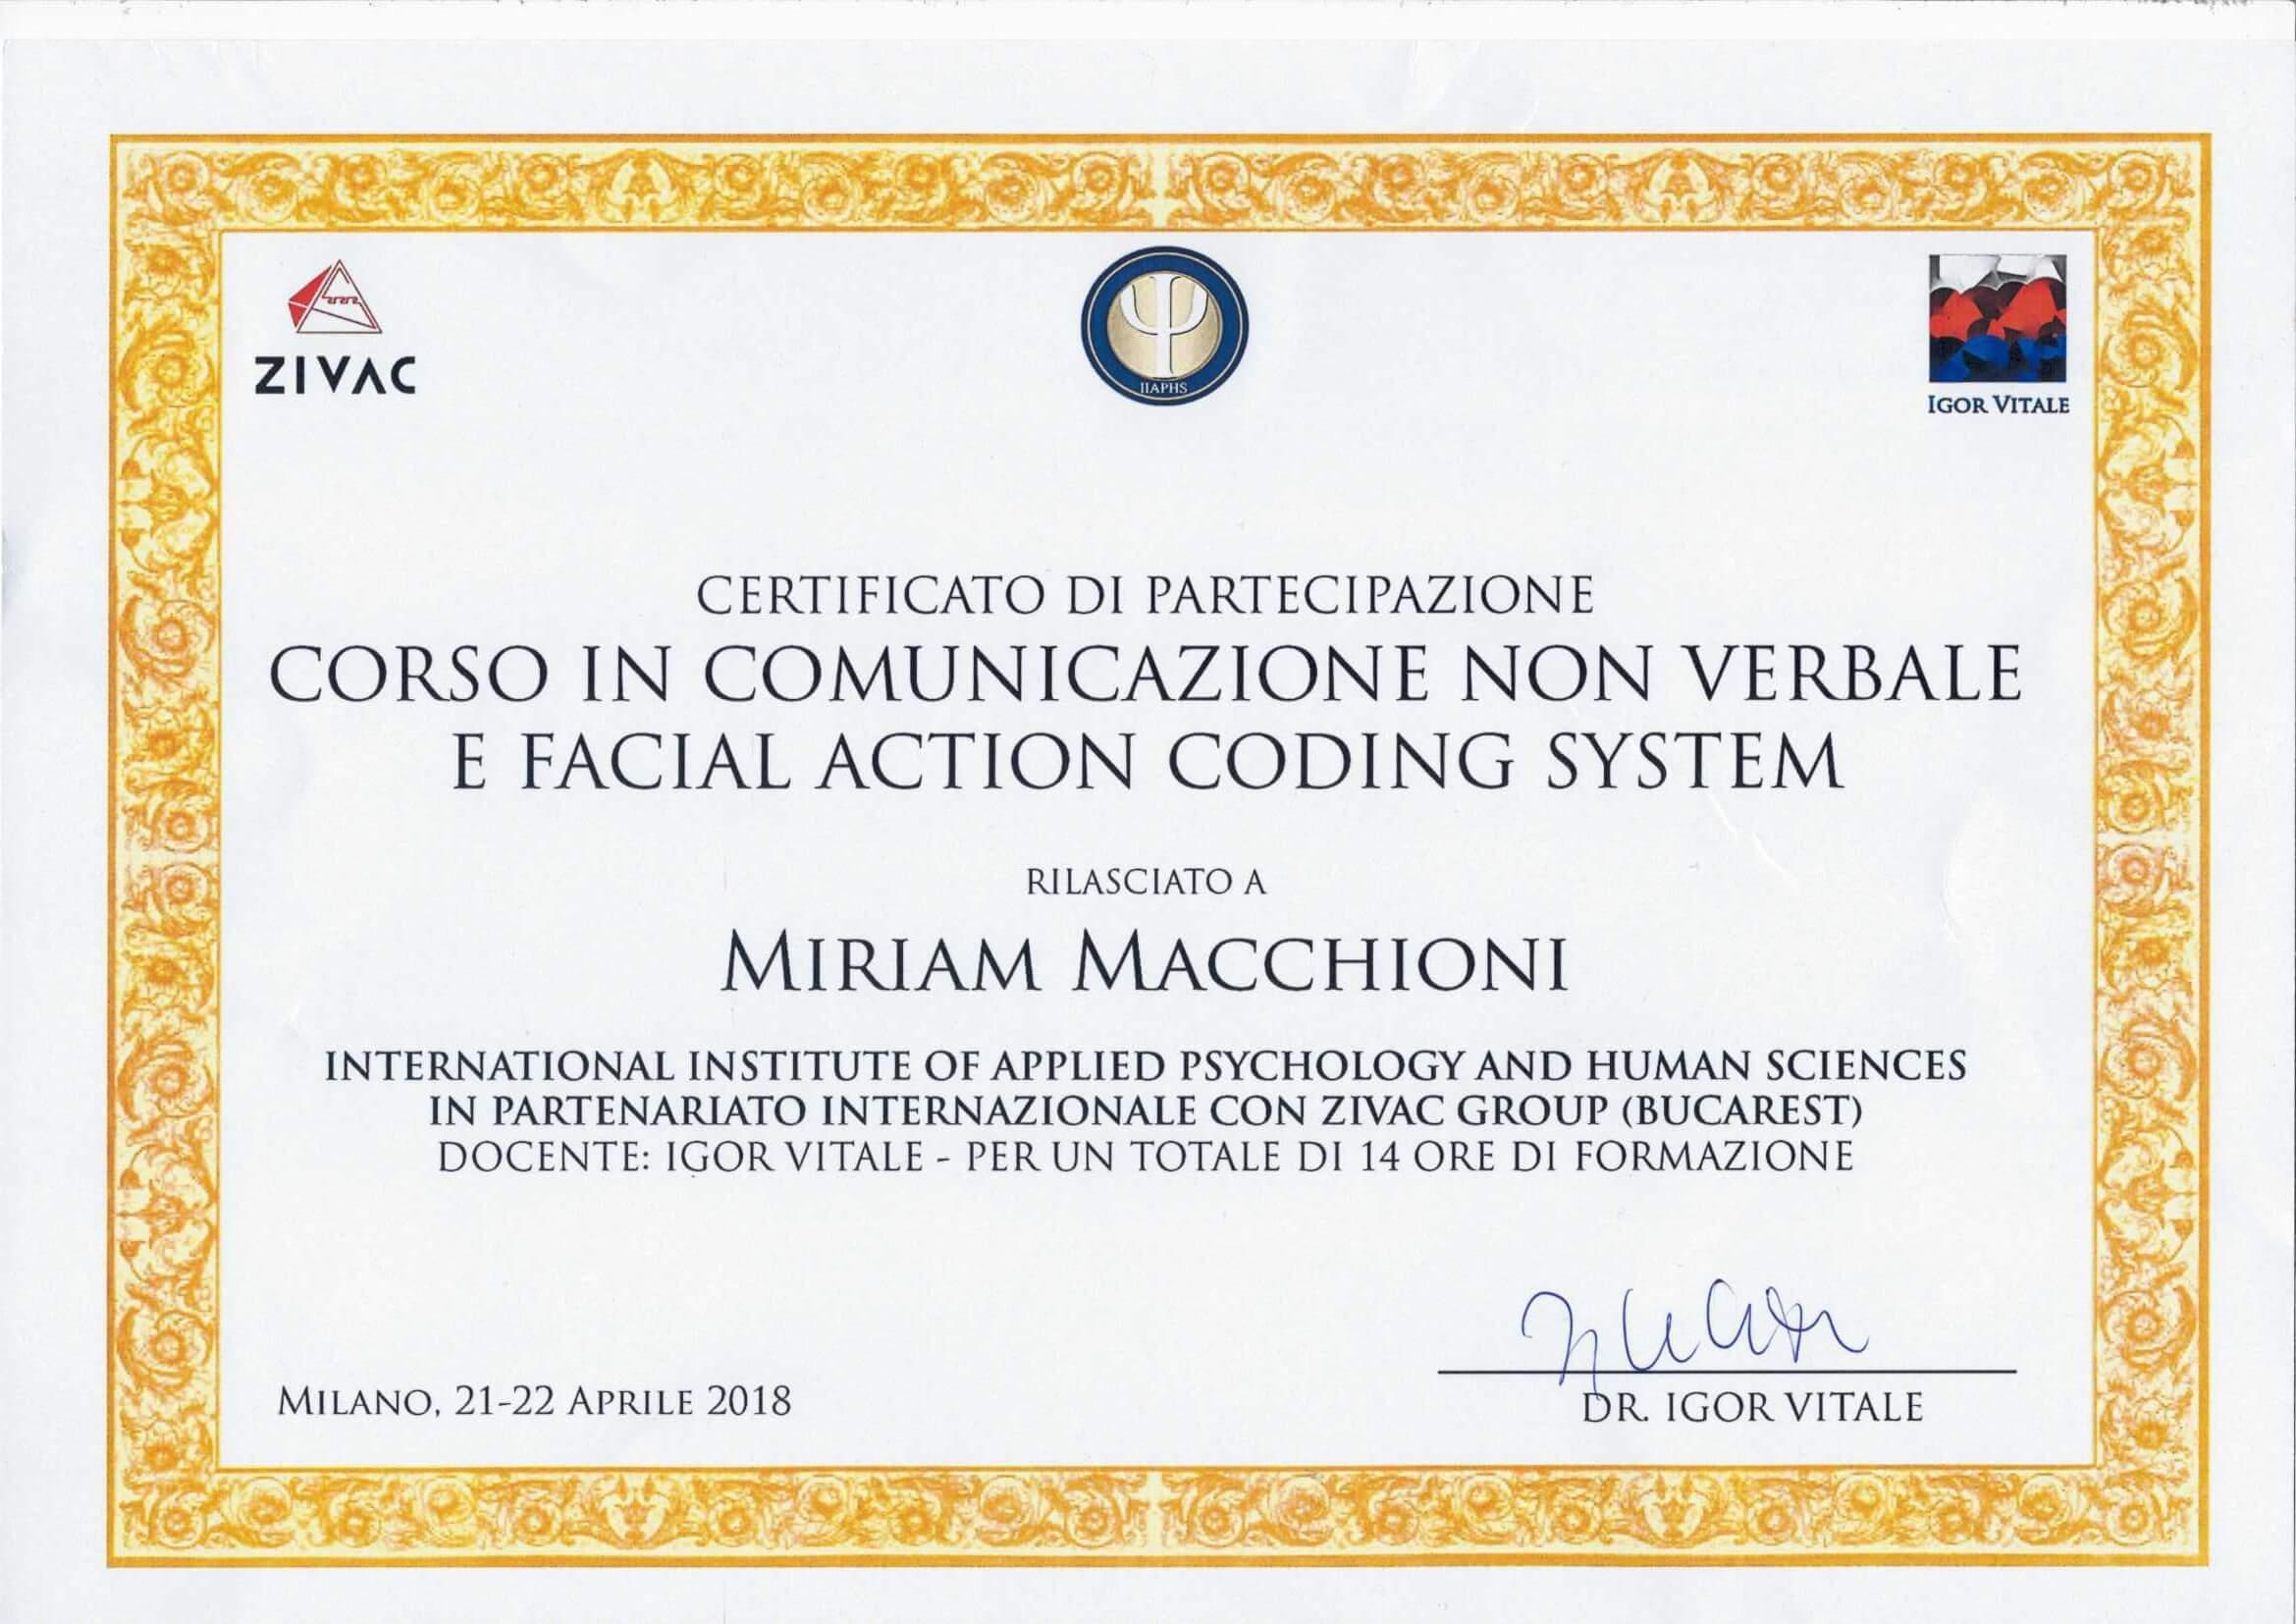 Comunicazione non verbale e Facial Action Coding System